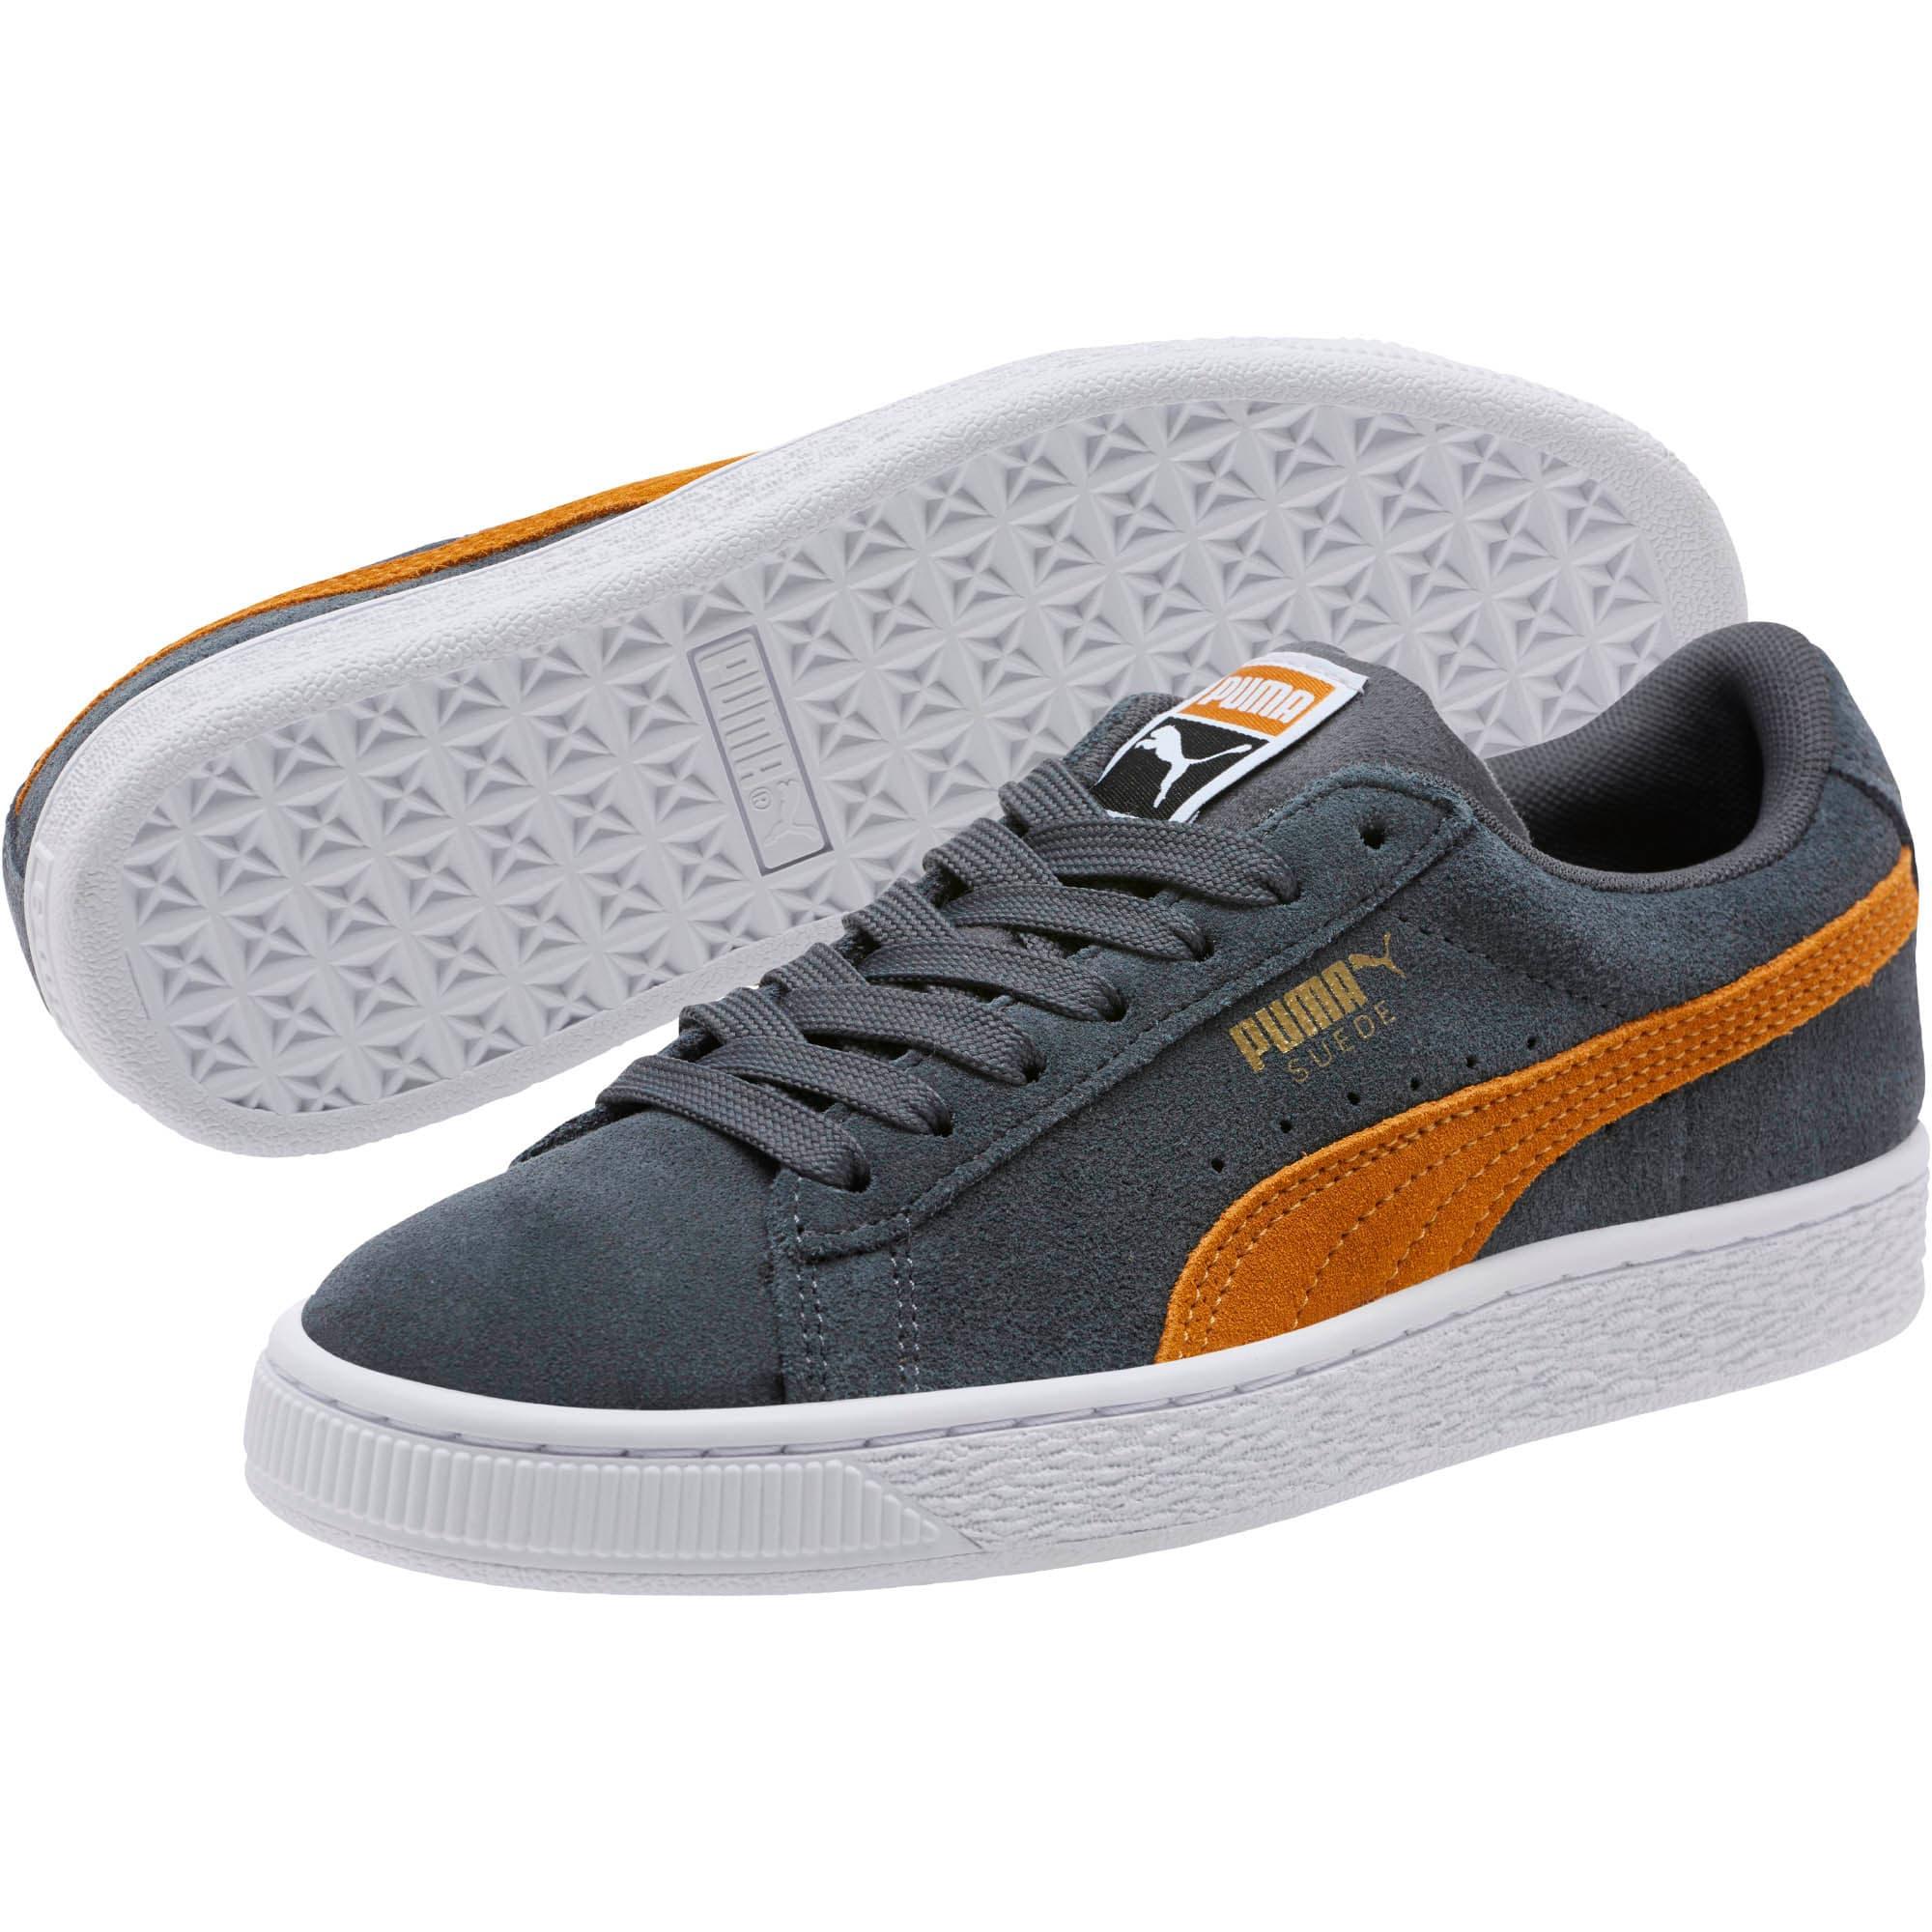 Thumbnail 2 of Suede Classic Sneakers JR, Iron Gate-Buckthorn, medium